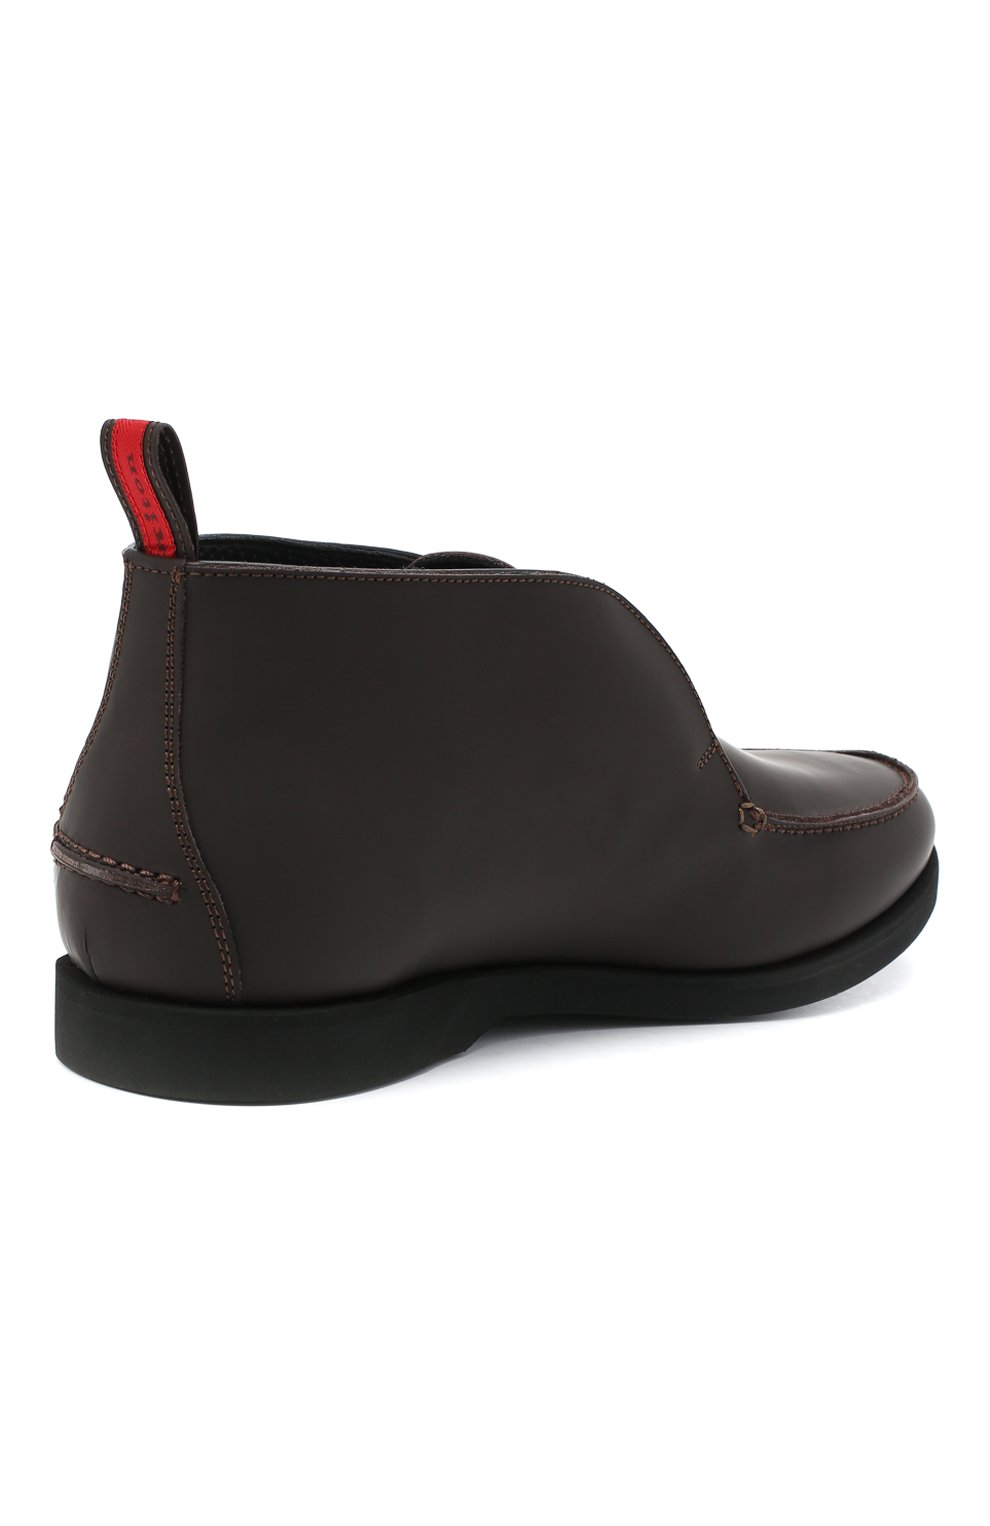 Мужские кожаные ботинки KITON коричневого цвета, арт. USSFLYN00674 | Фото 4